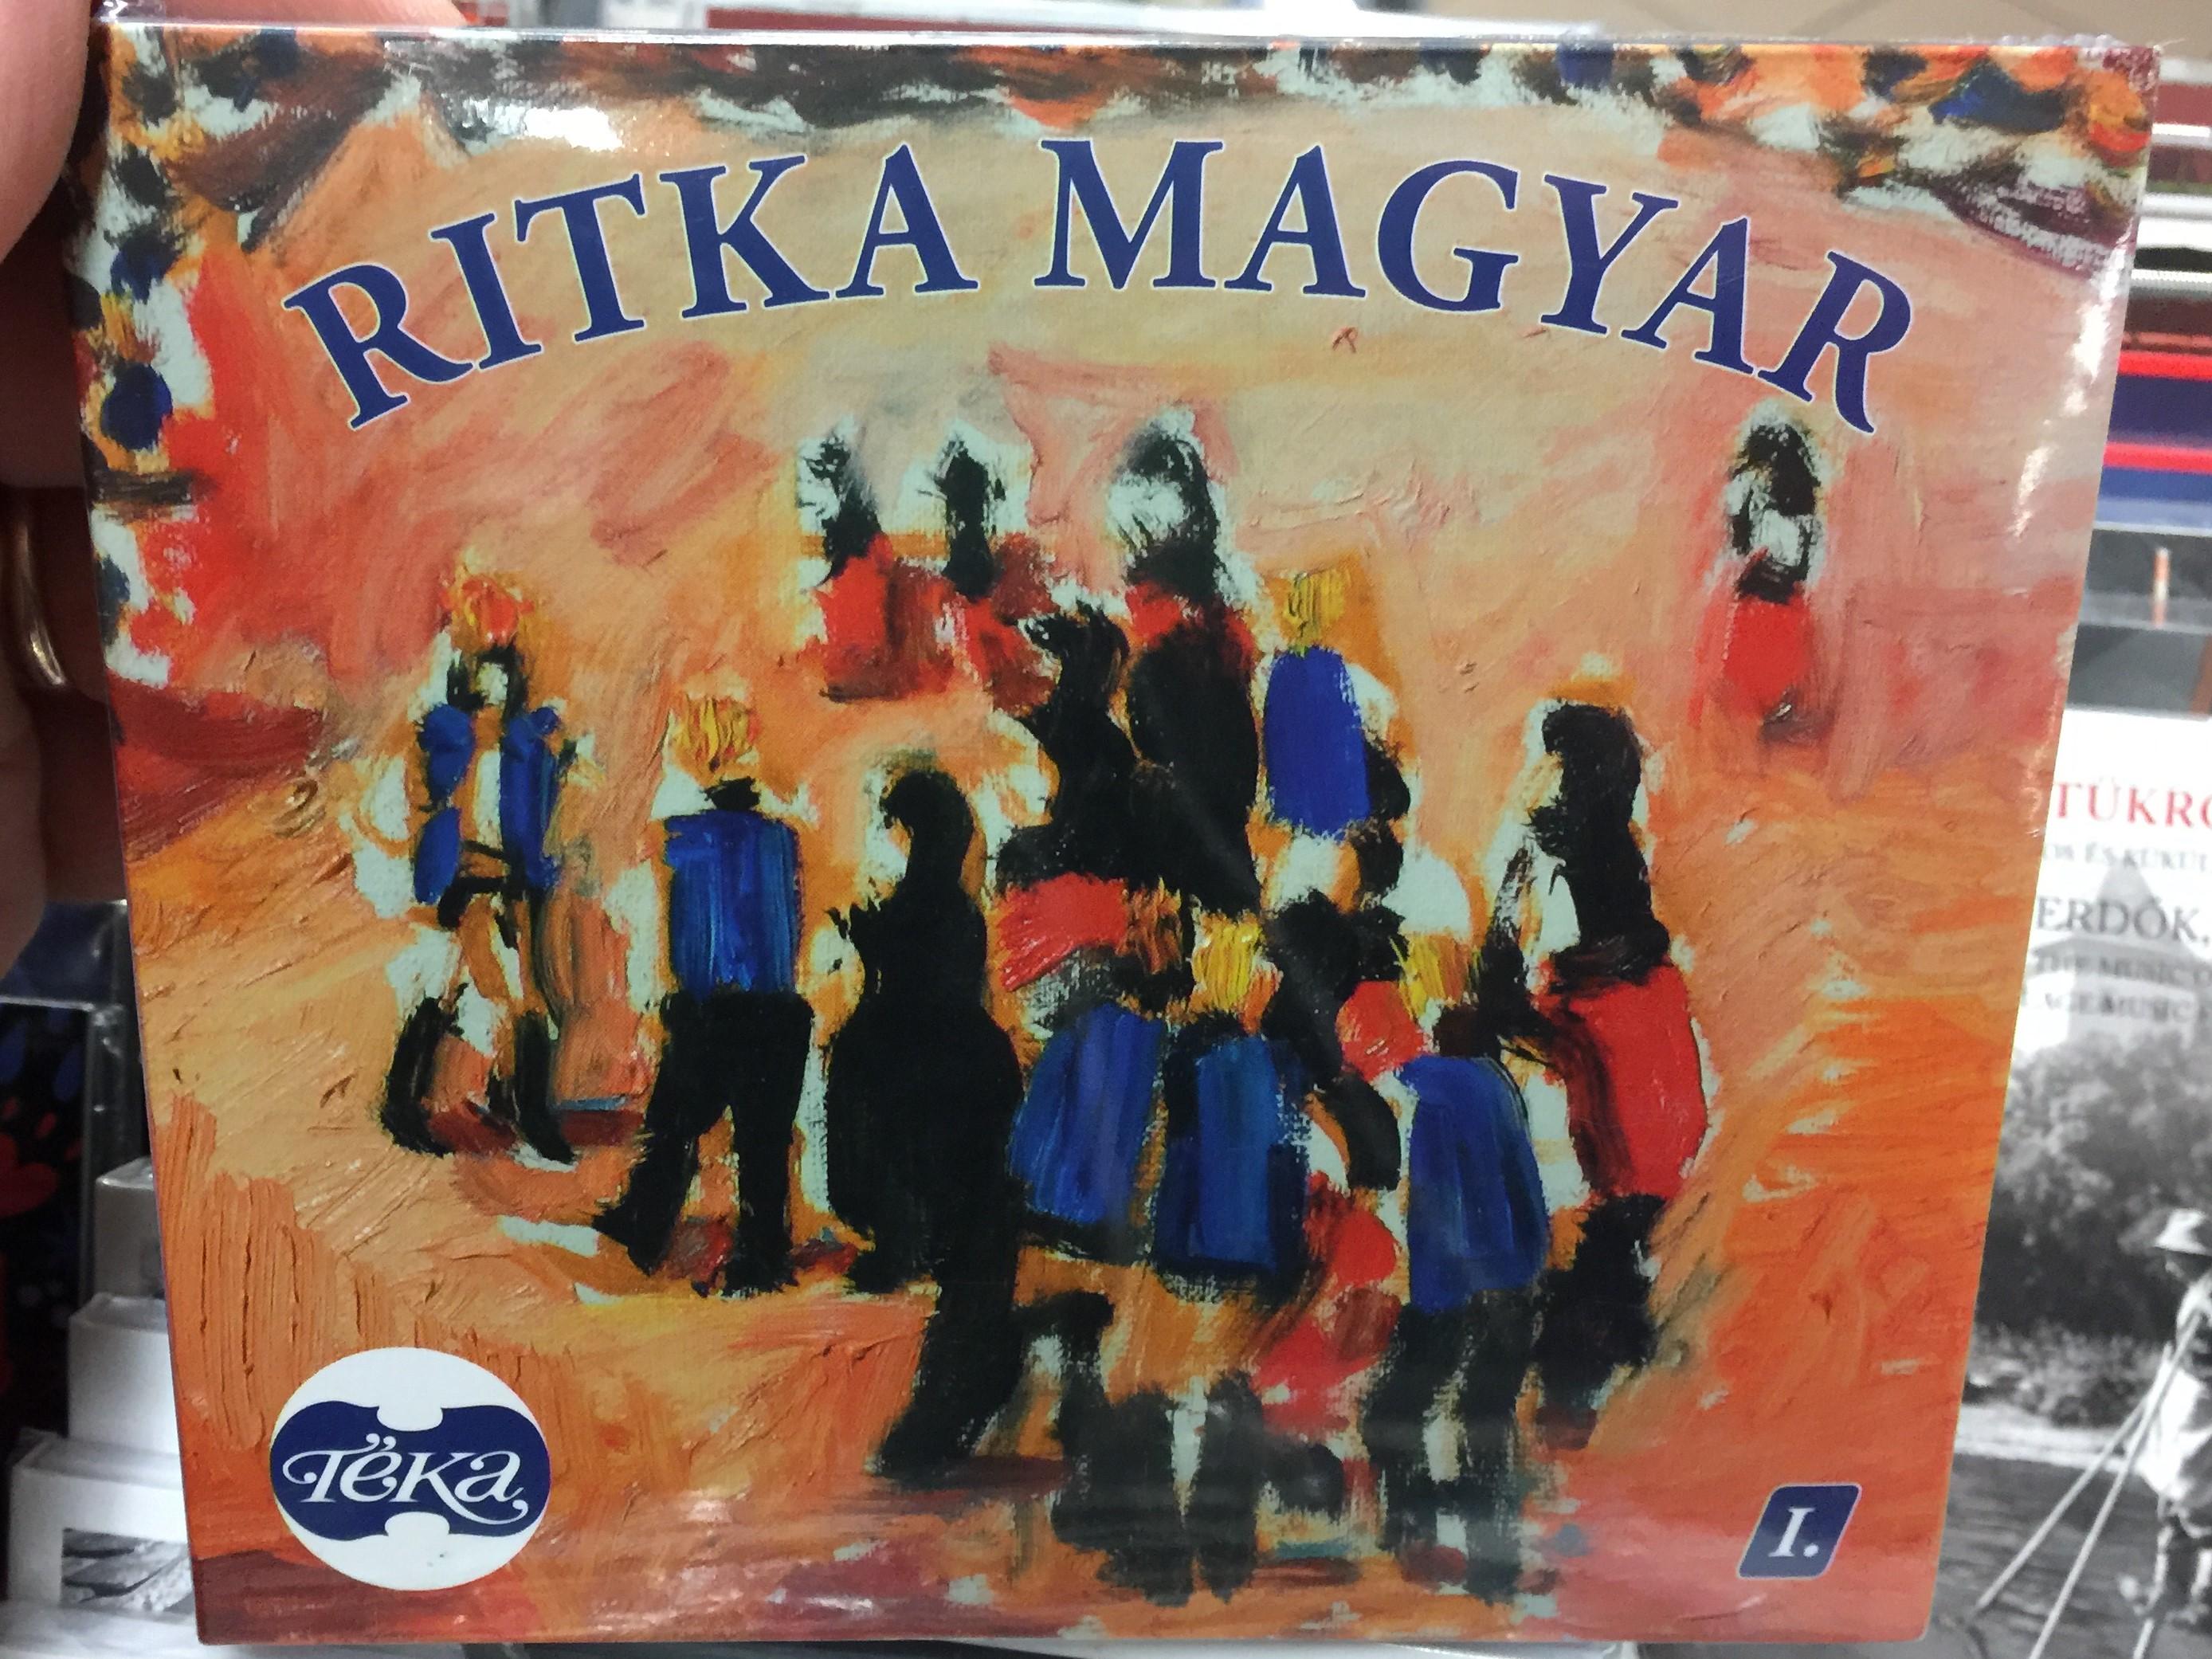 ritka-magyar-i.-t-ka-fon-records-audio-cd-2015-fa-375-2-1-.jpg